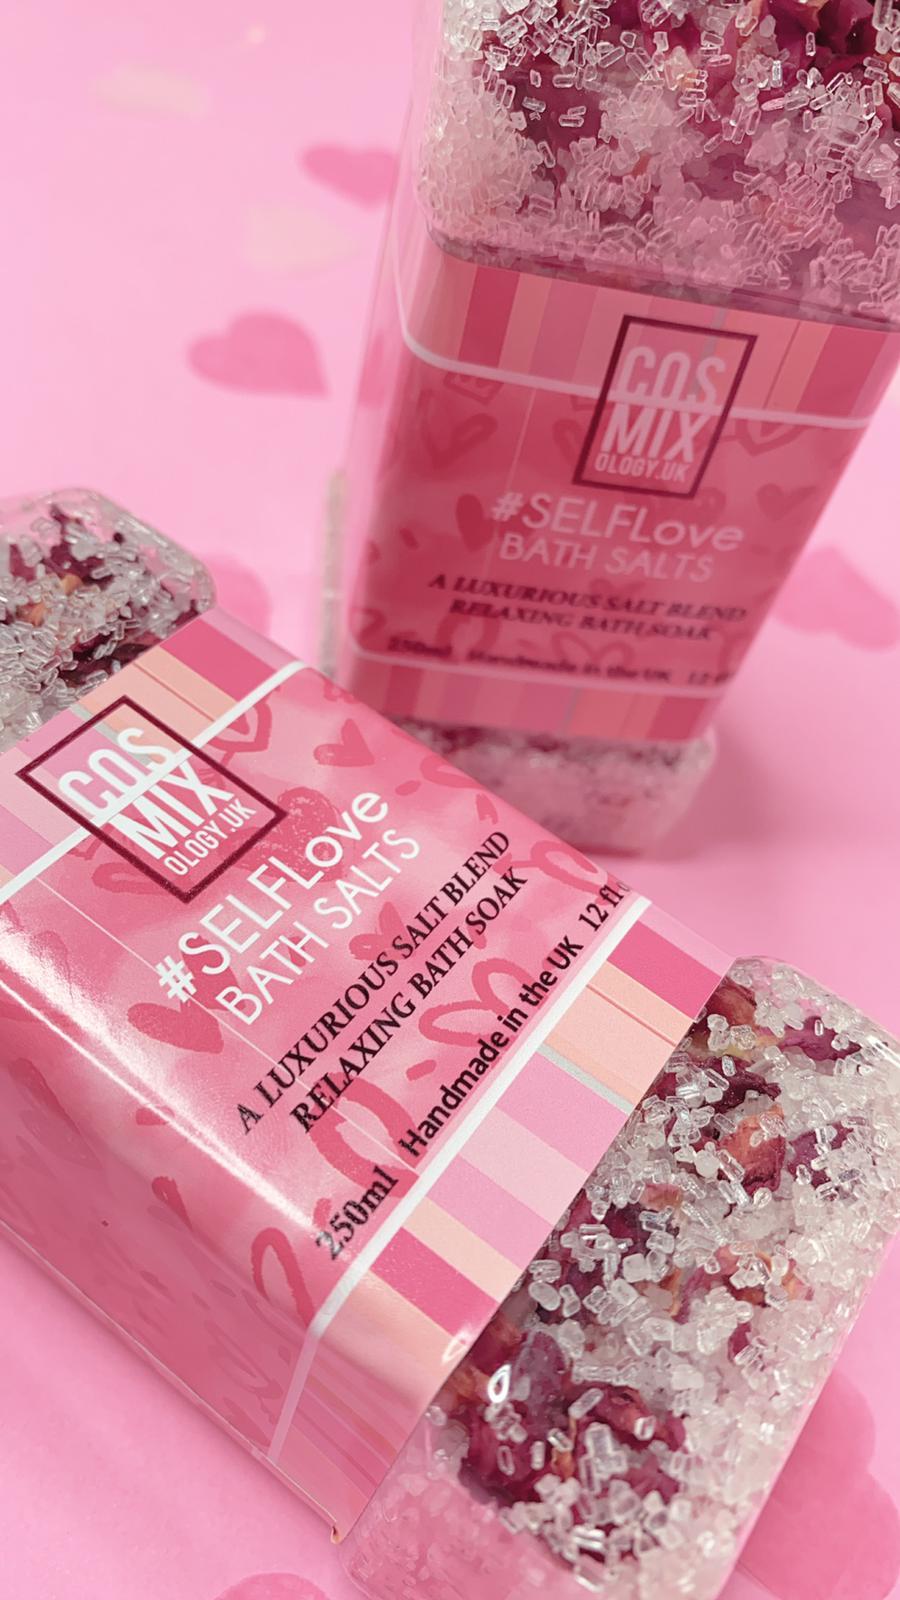 #SELFLOVE Epsom Salts Bath Soak Kind Shop 2